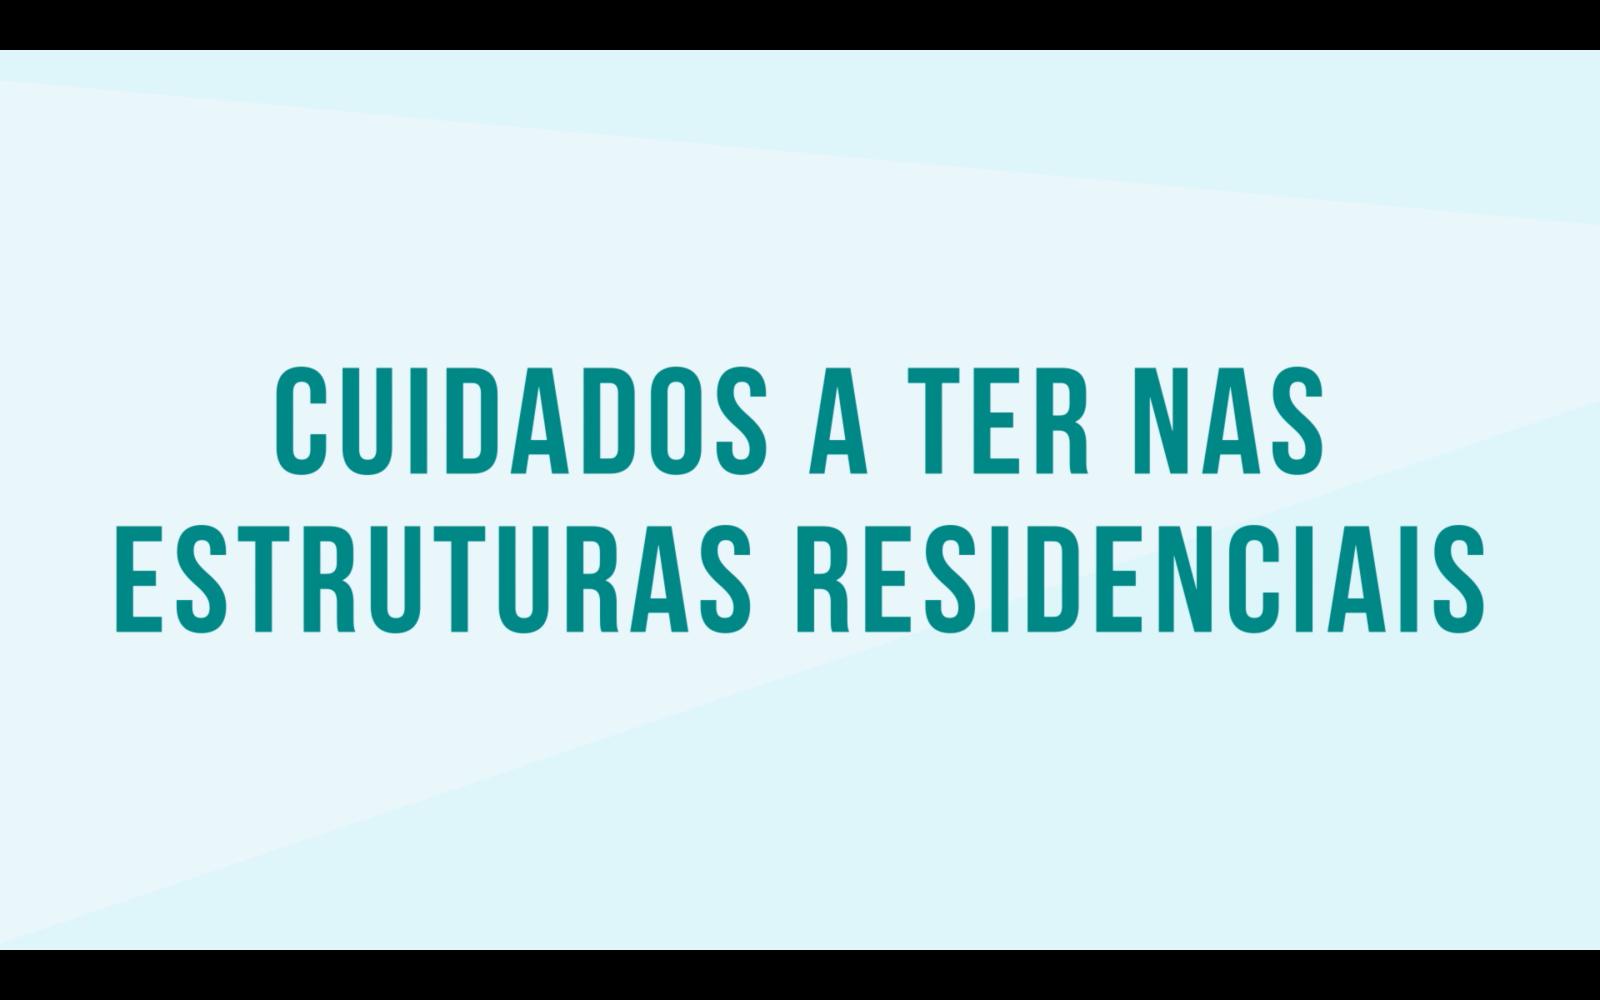 Covid-19 | Filme sobre cuidados a ter nas estruturas residenciais